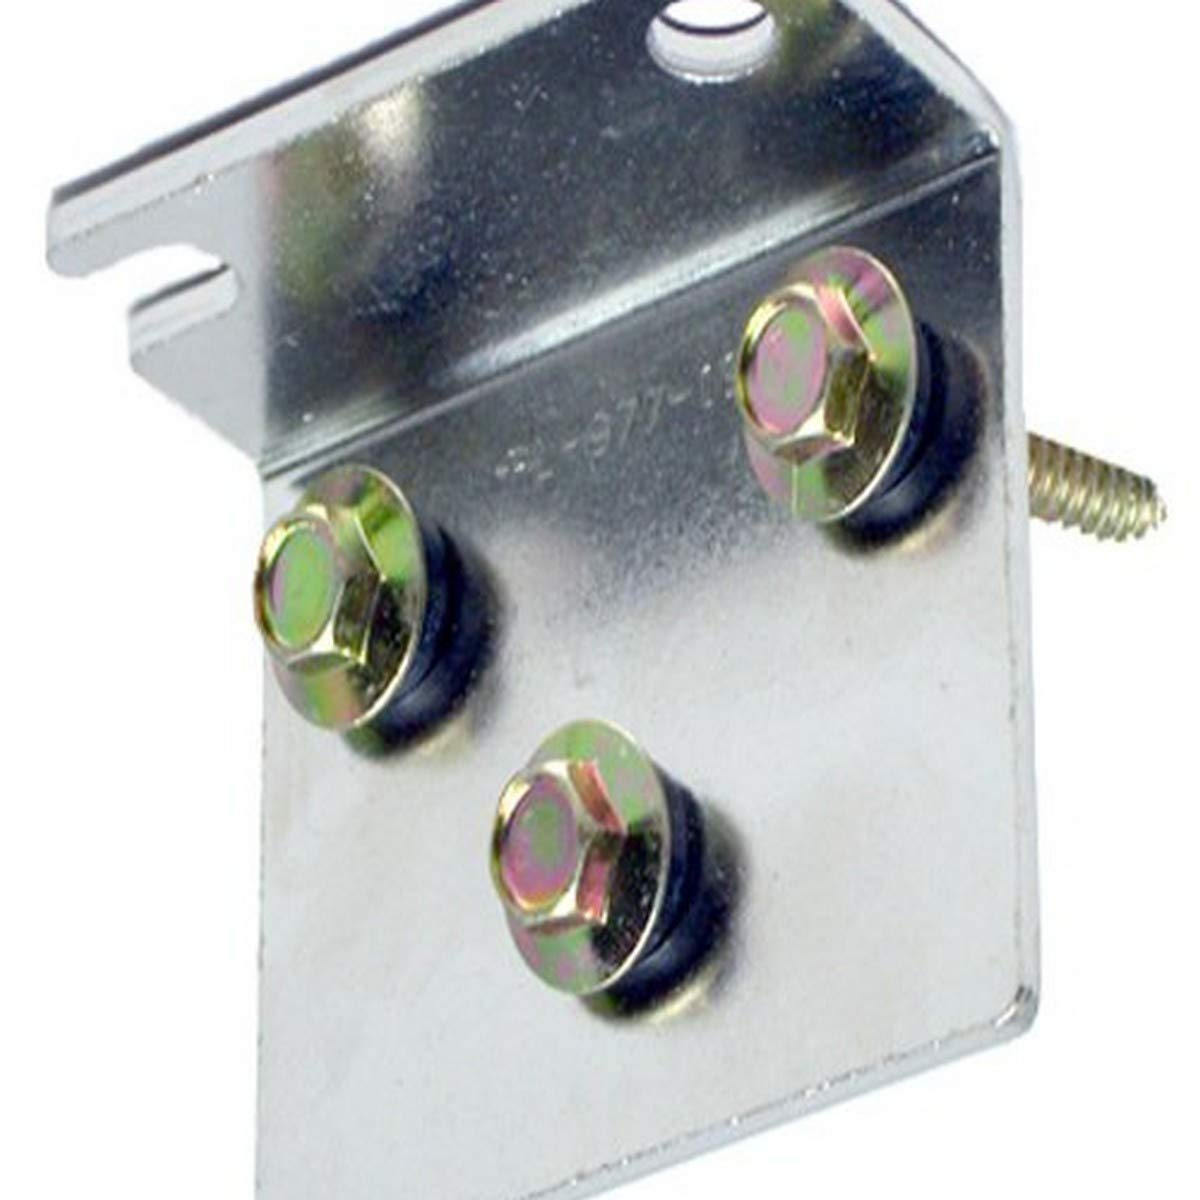 ShurLok SL-150 Wall Mount For Key Storage Combination Lock Box, Silver